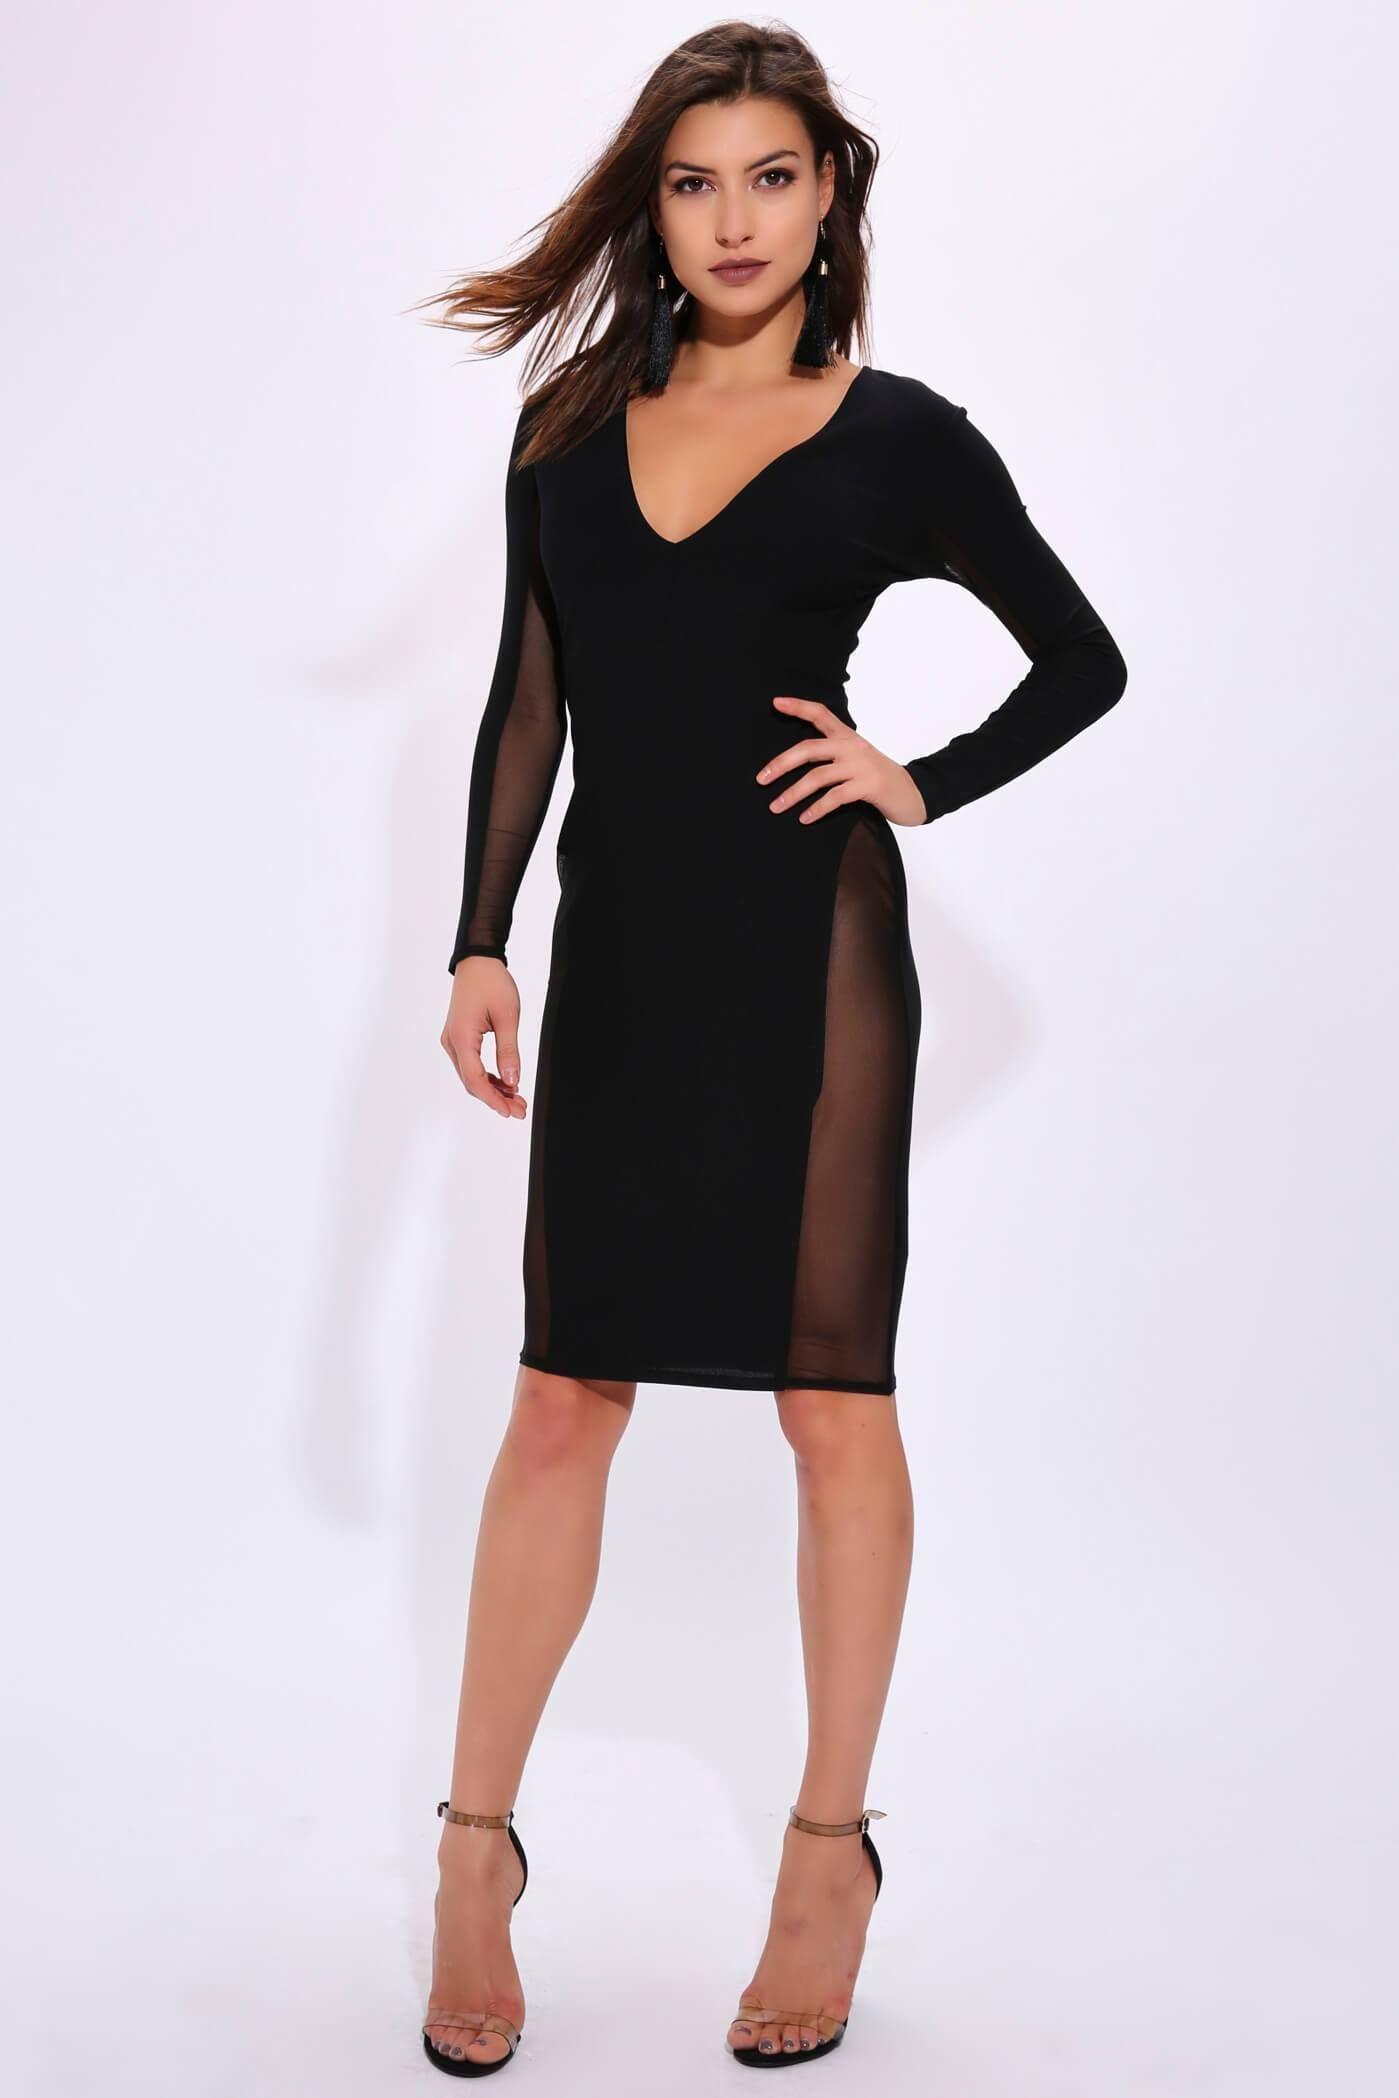 6fea30e169e68 Black Plunge Long Sheer Sleeve Bodycon Midi Dress | Products ...